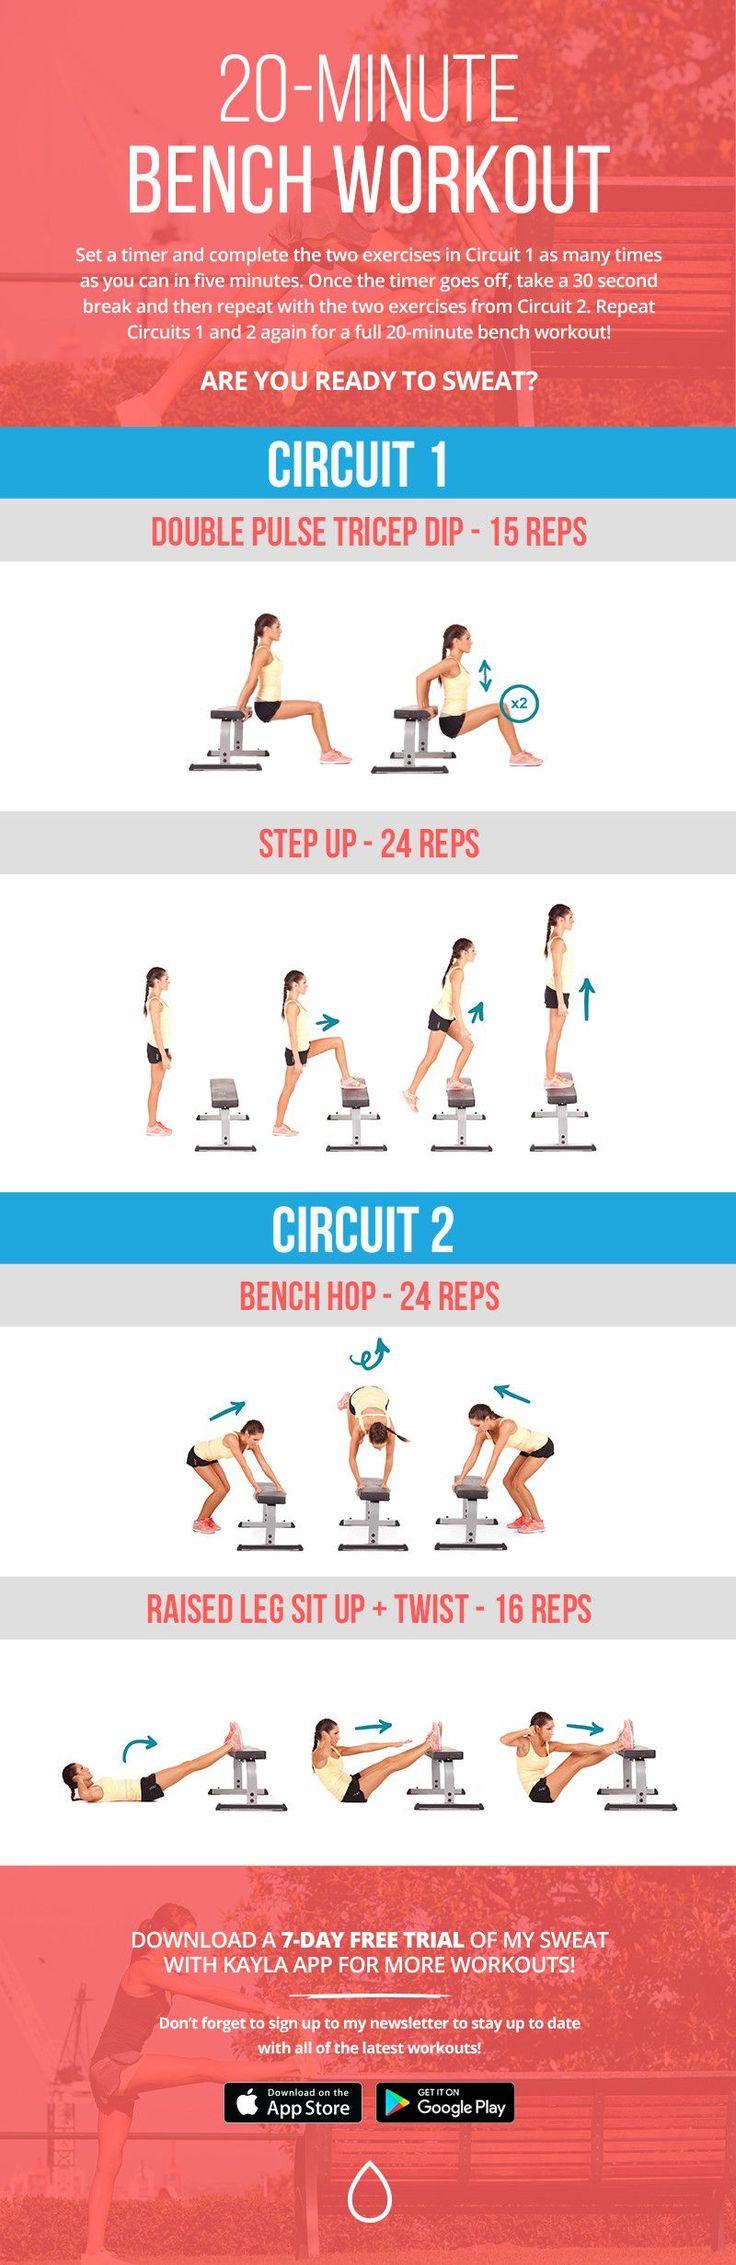 20-Minute Bench Workout! – Kayla Itsines